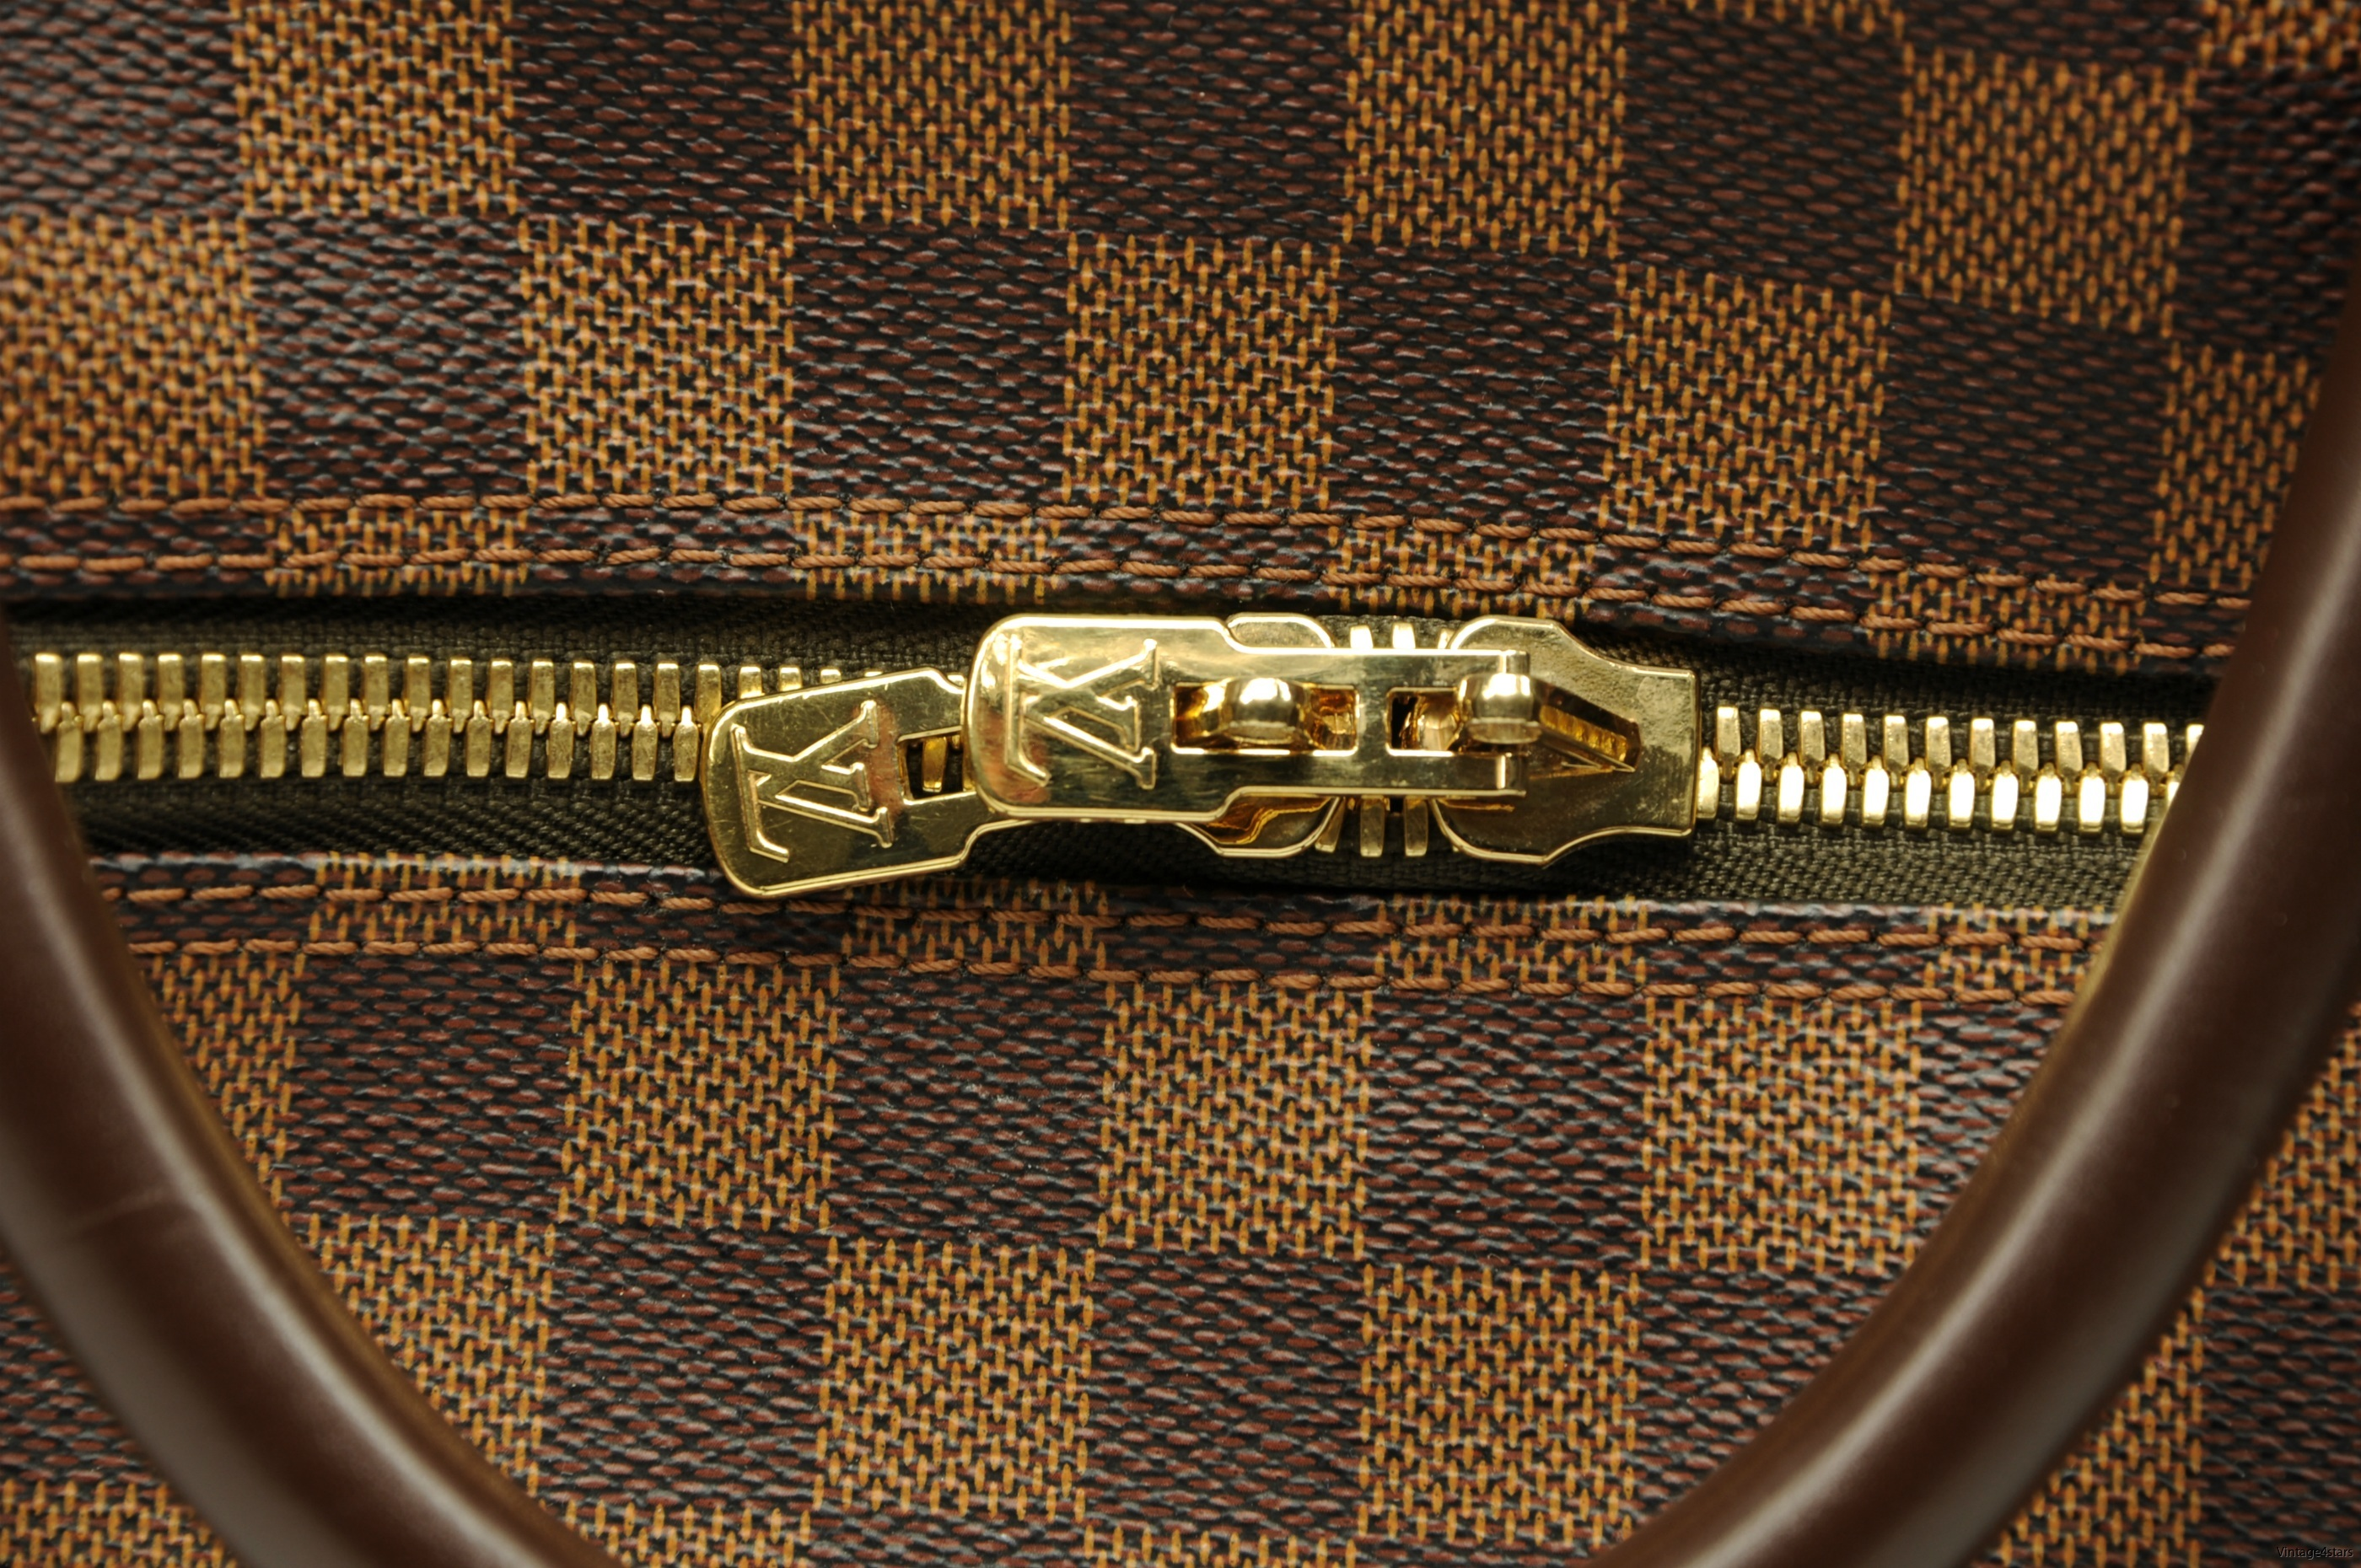 Louis Vuitton Eole 60 Damier Ebene 10